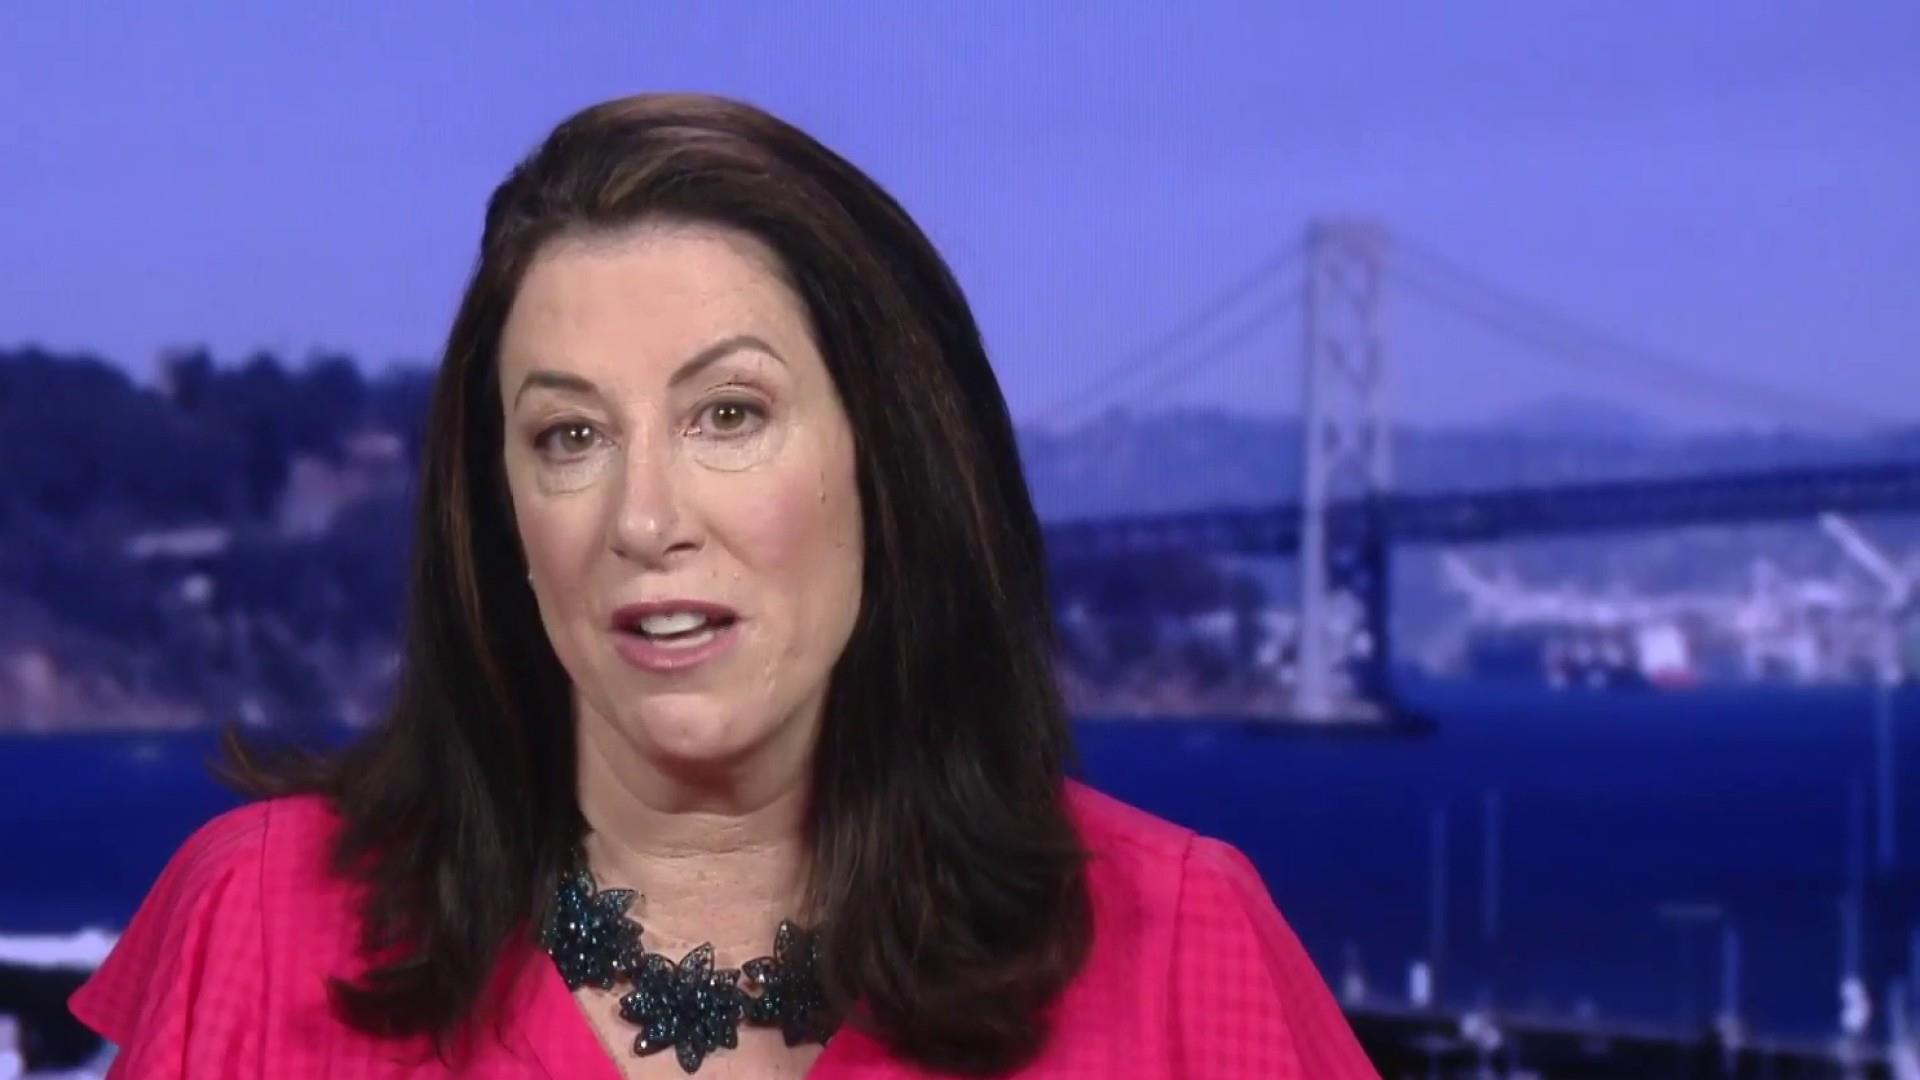 Christine Pelosi on doctored video: it's a 'vicious, sleazy, trashy lie'